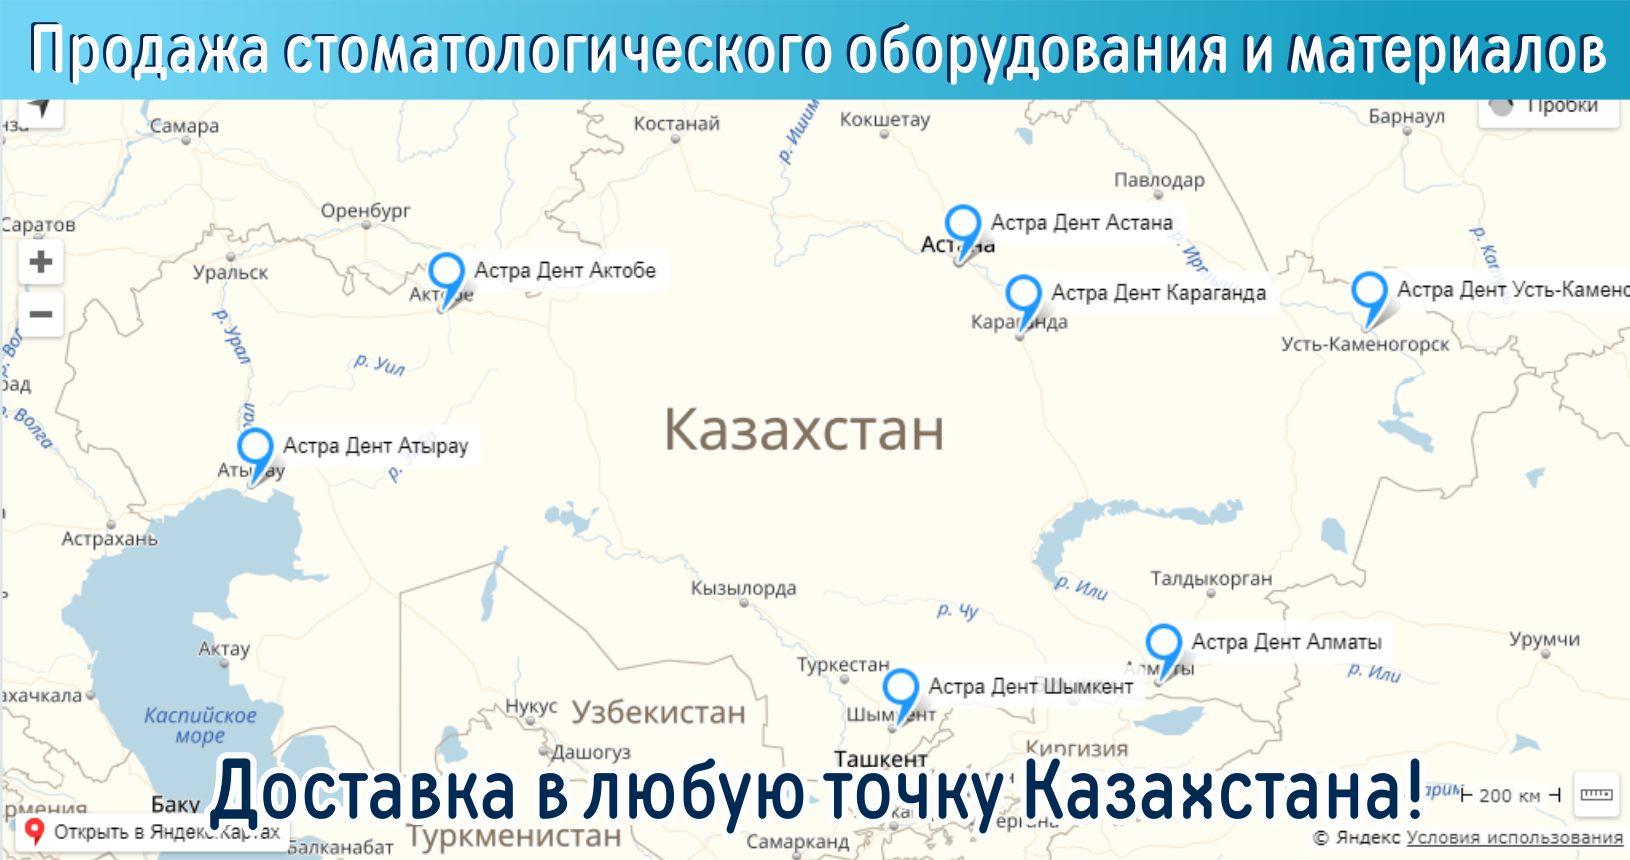 Филиалы Астра Дента в Казахстане